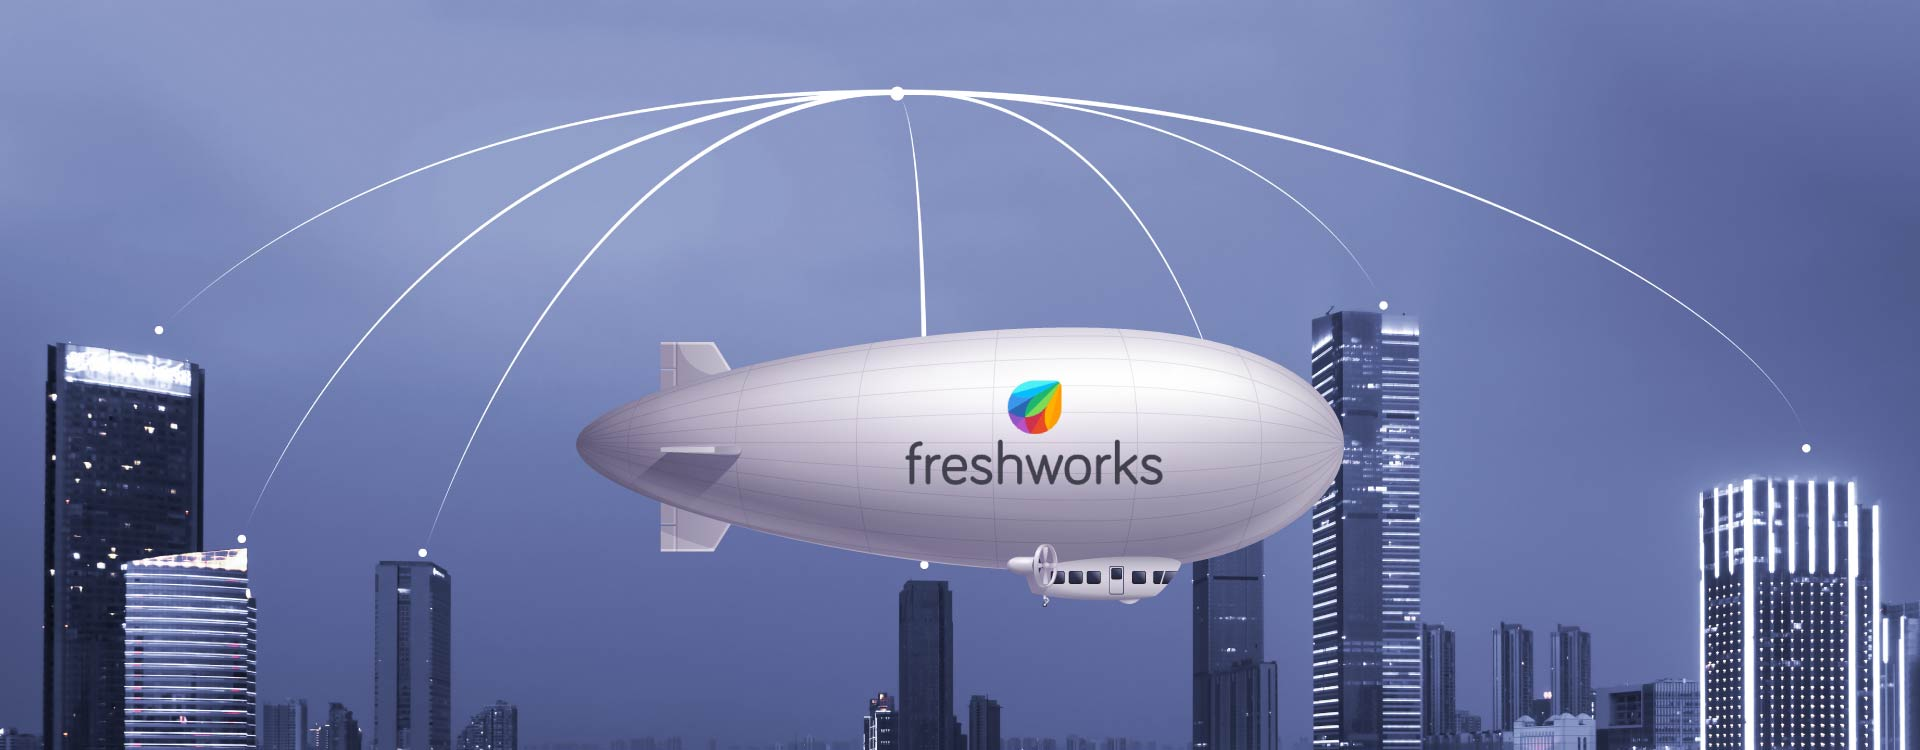 40% year over year, Freshworks Impressive Growth